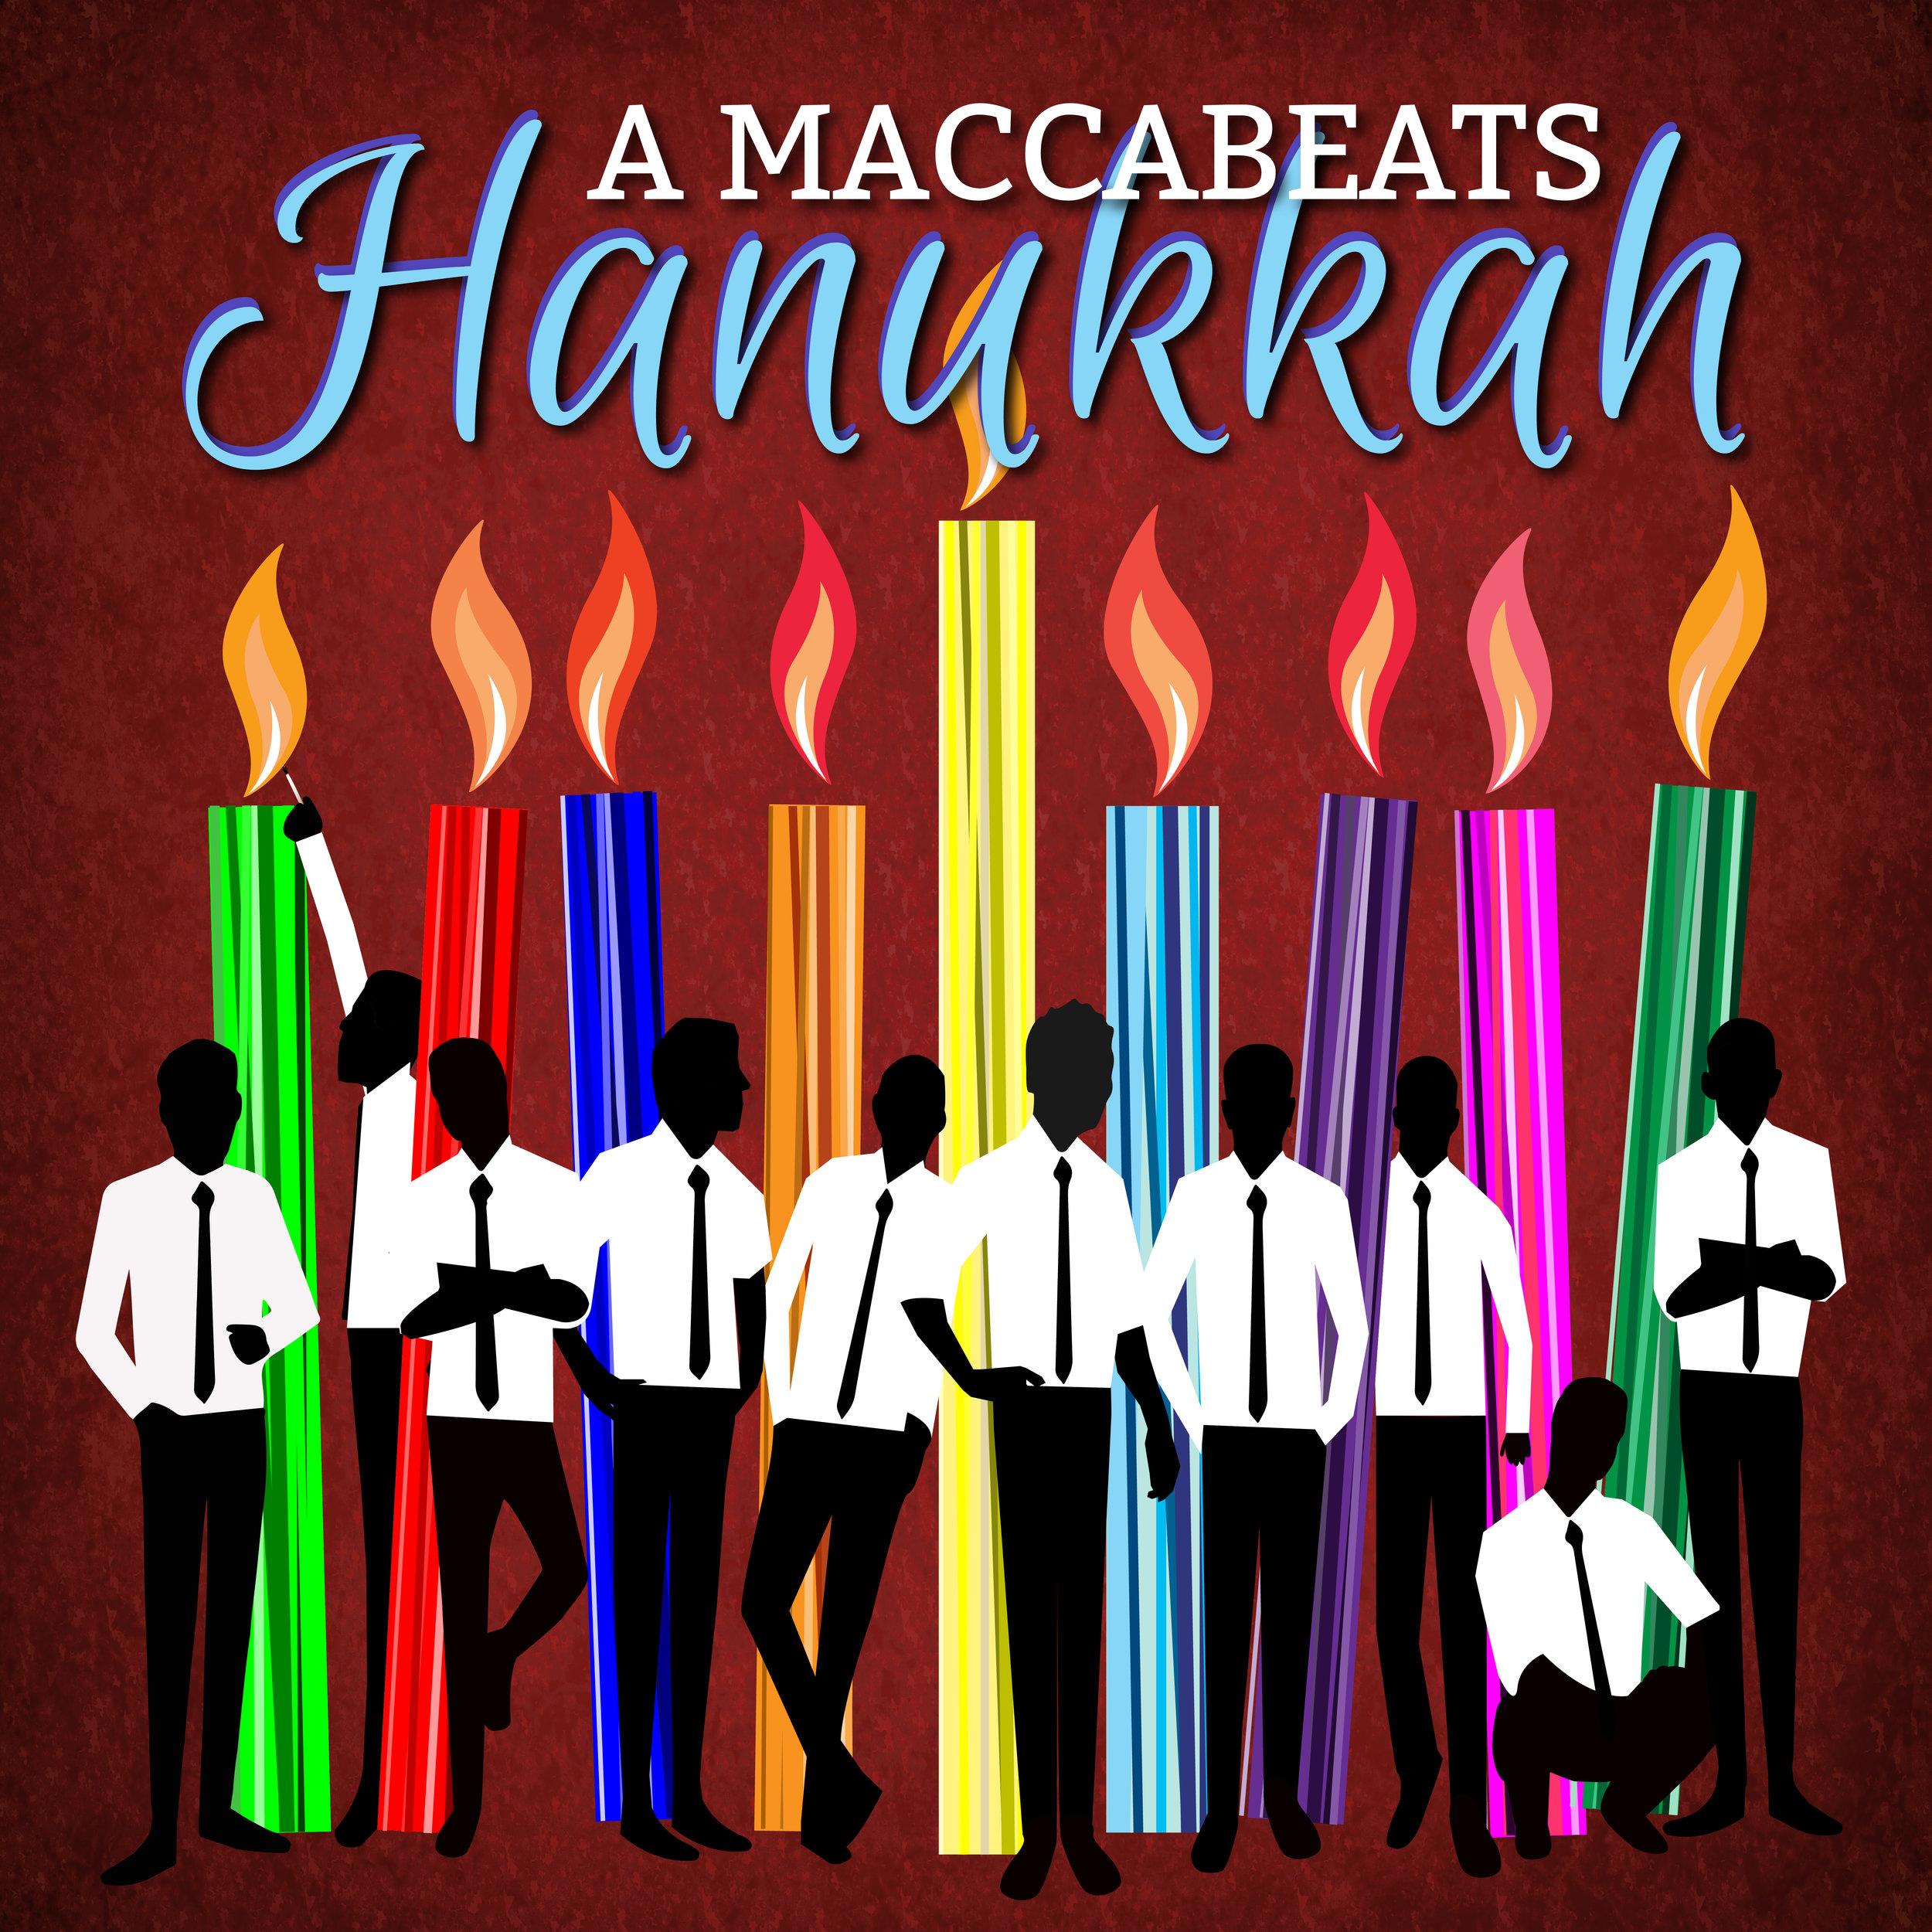 A Maccabeats Hanukkah - Album Artwork, Maccabeats